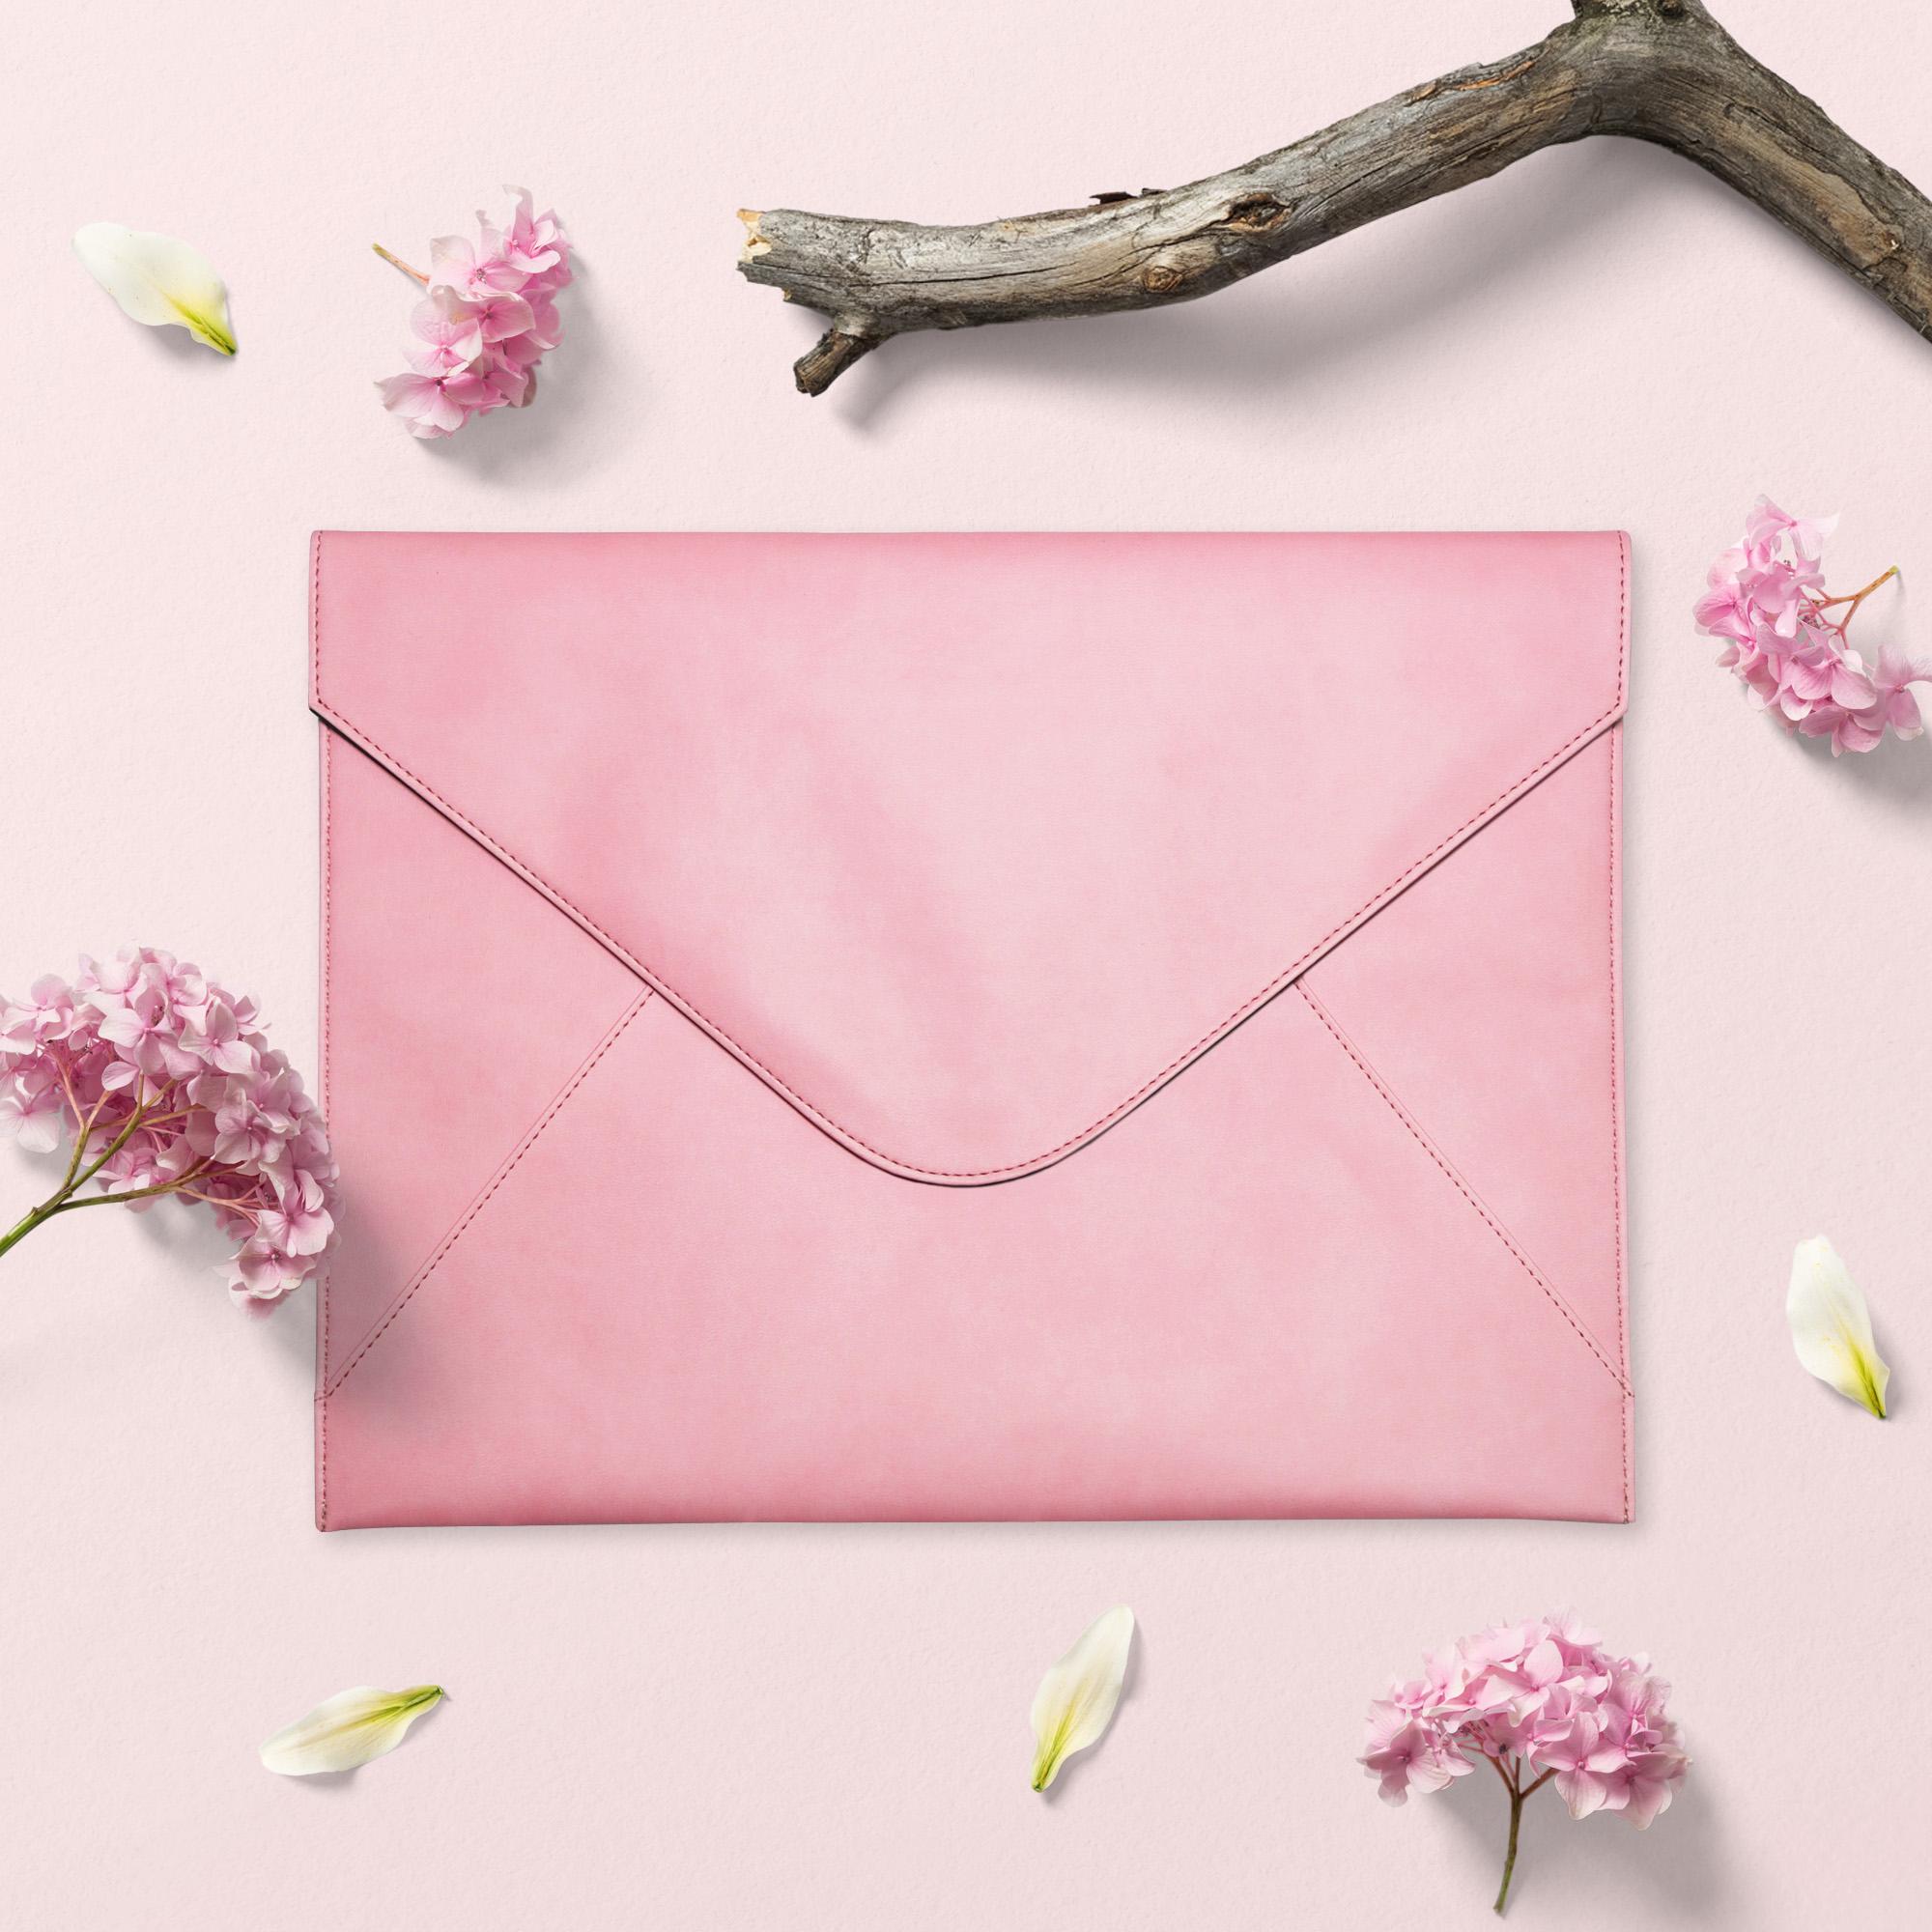 OEM 14 بوصة الترويجية هدية بو دفتر حقيبة كم جراب للماك بوك